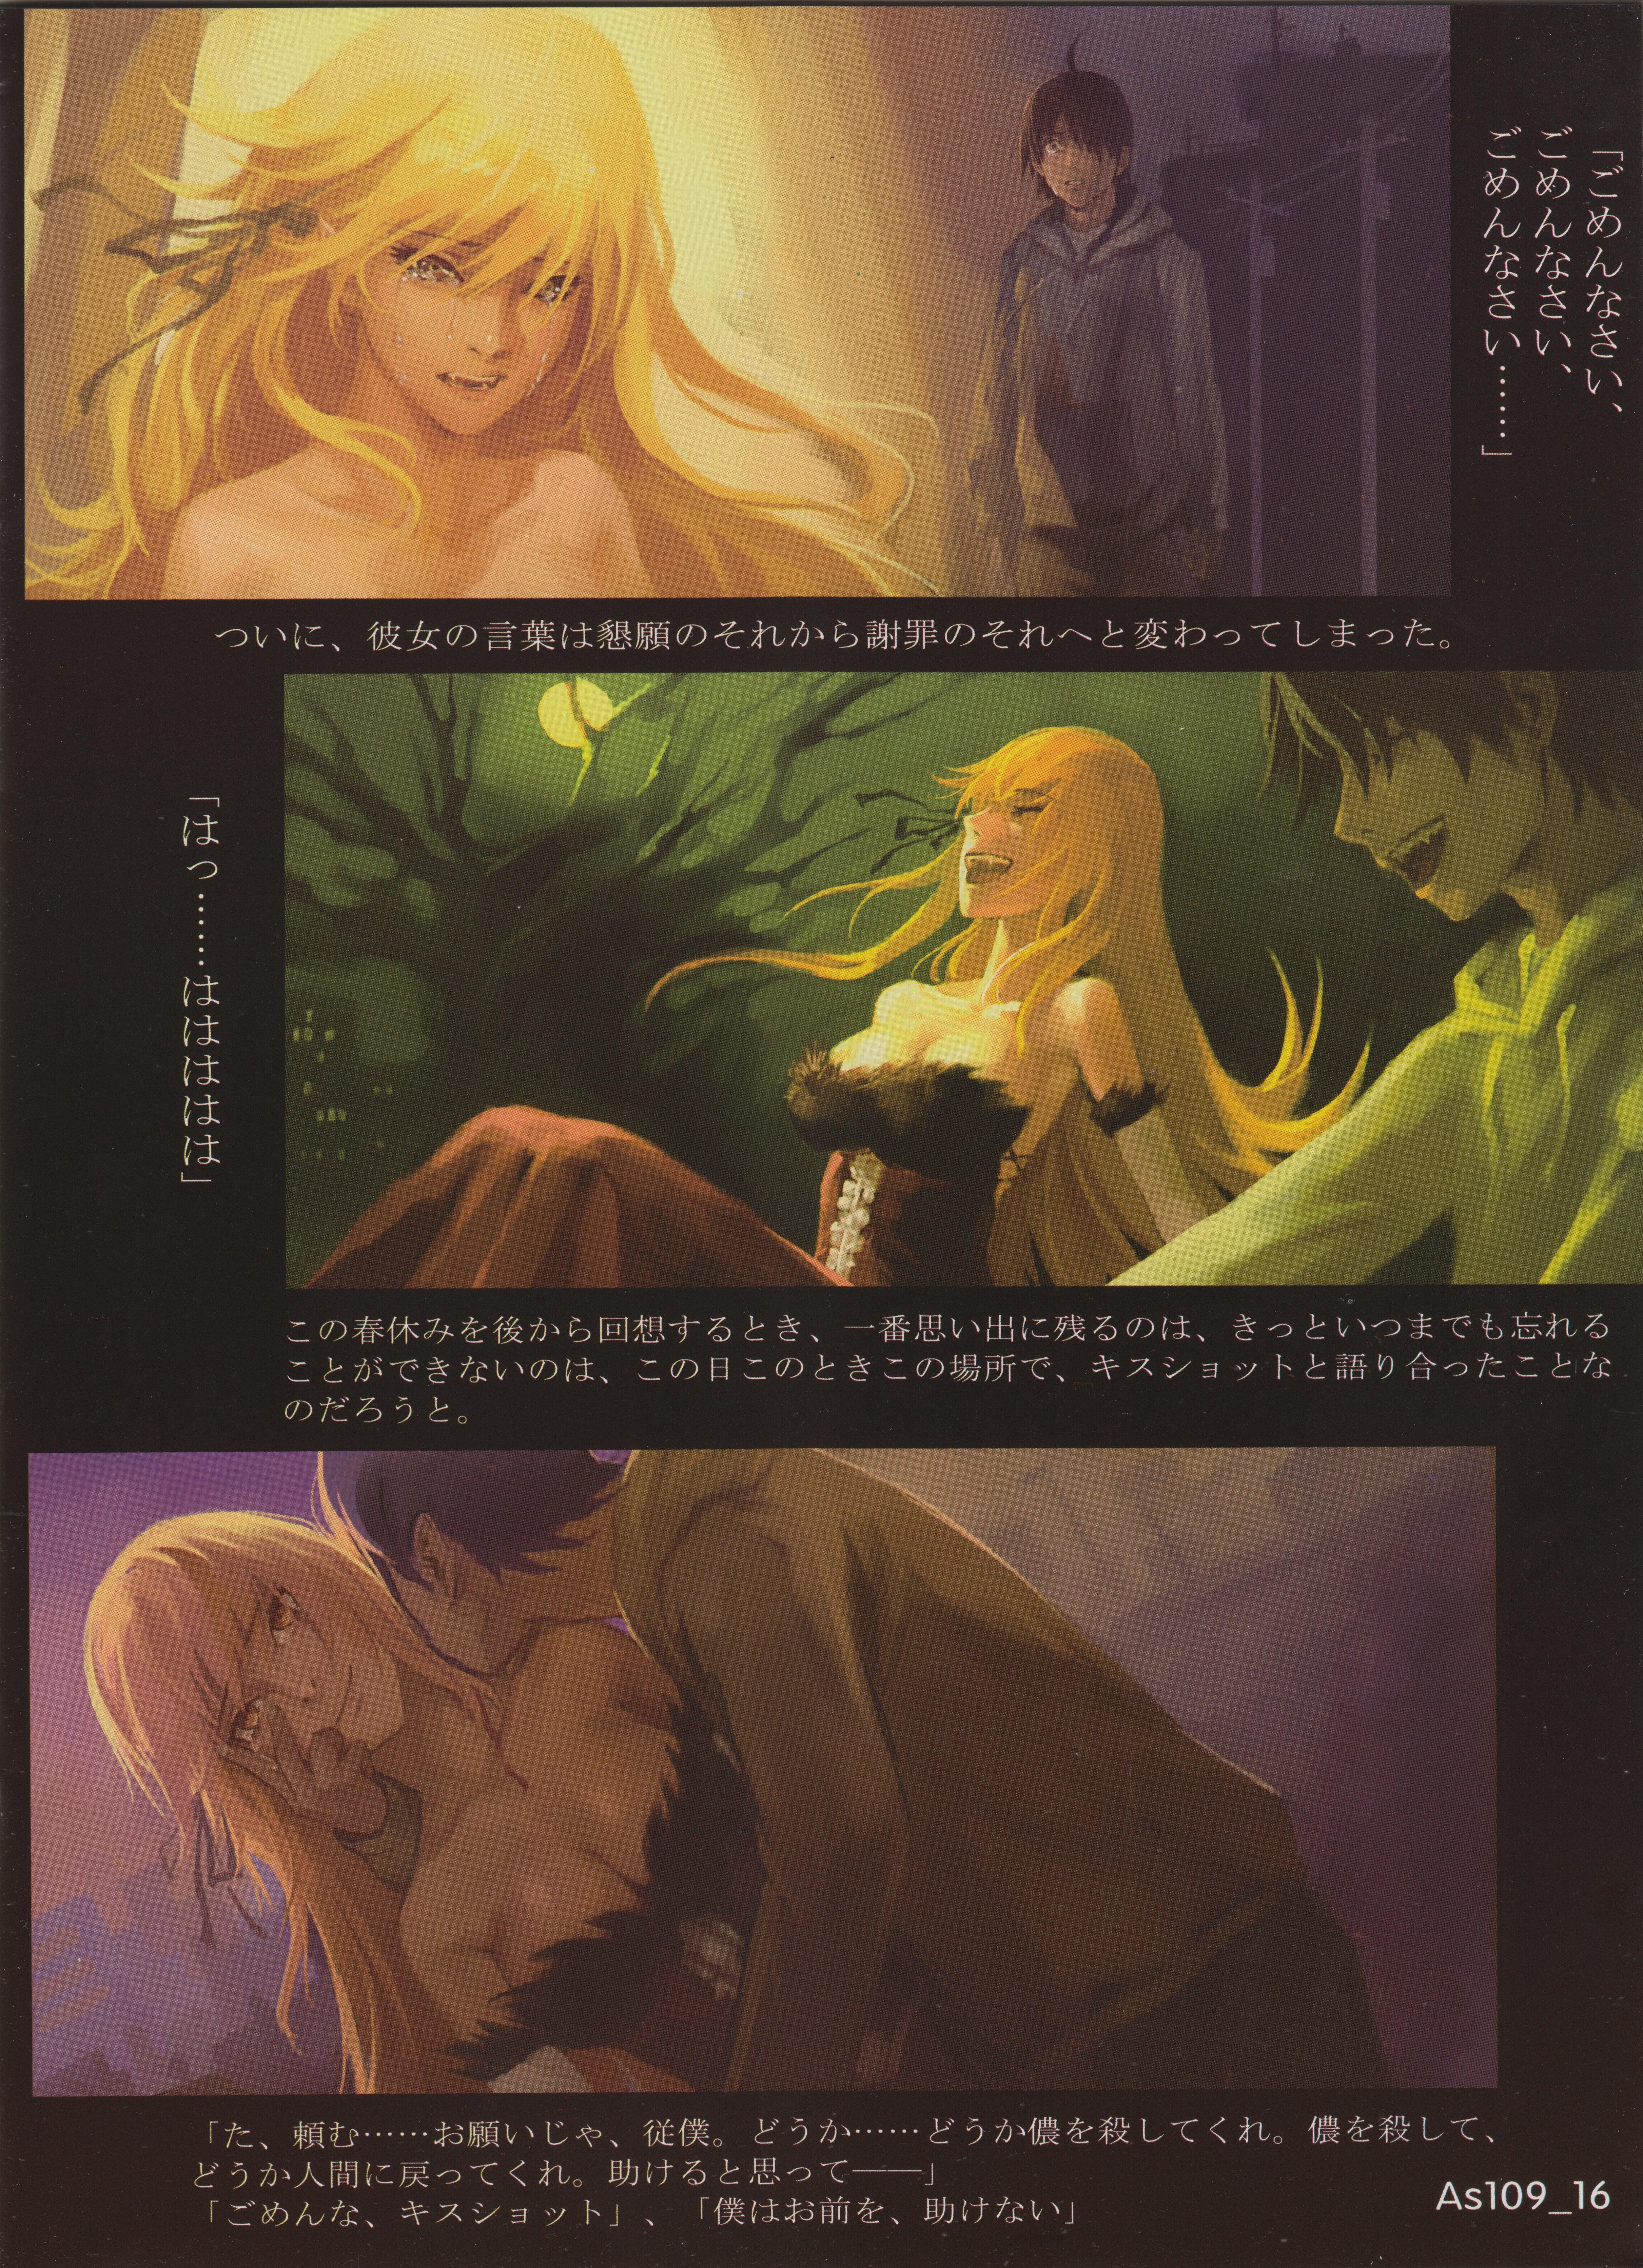 Monogatari Mobile Wallpaper 1803246 Zerochan Anime Image Board